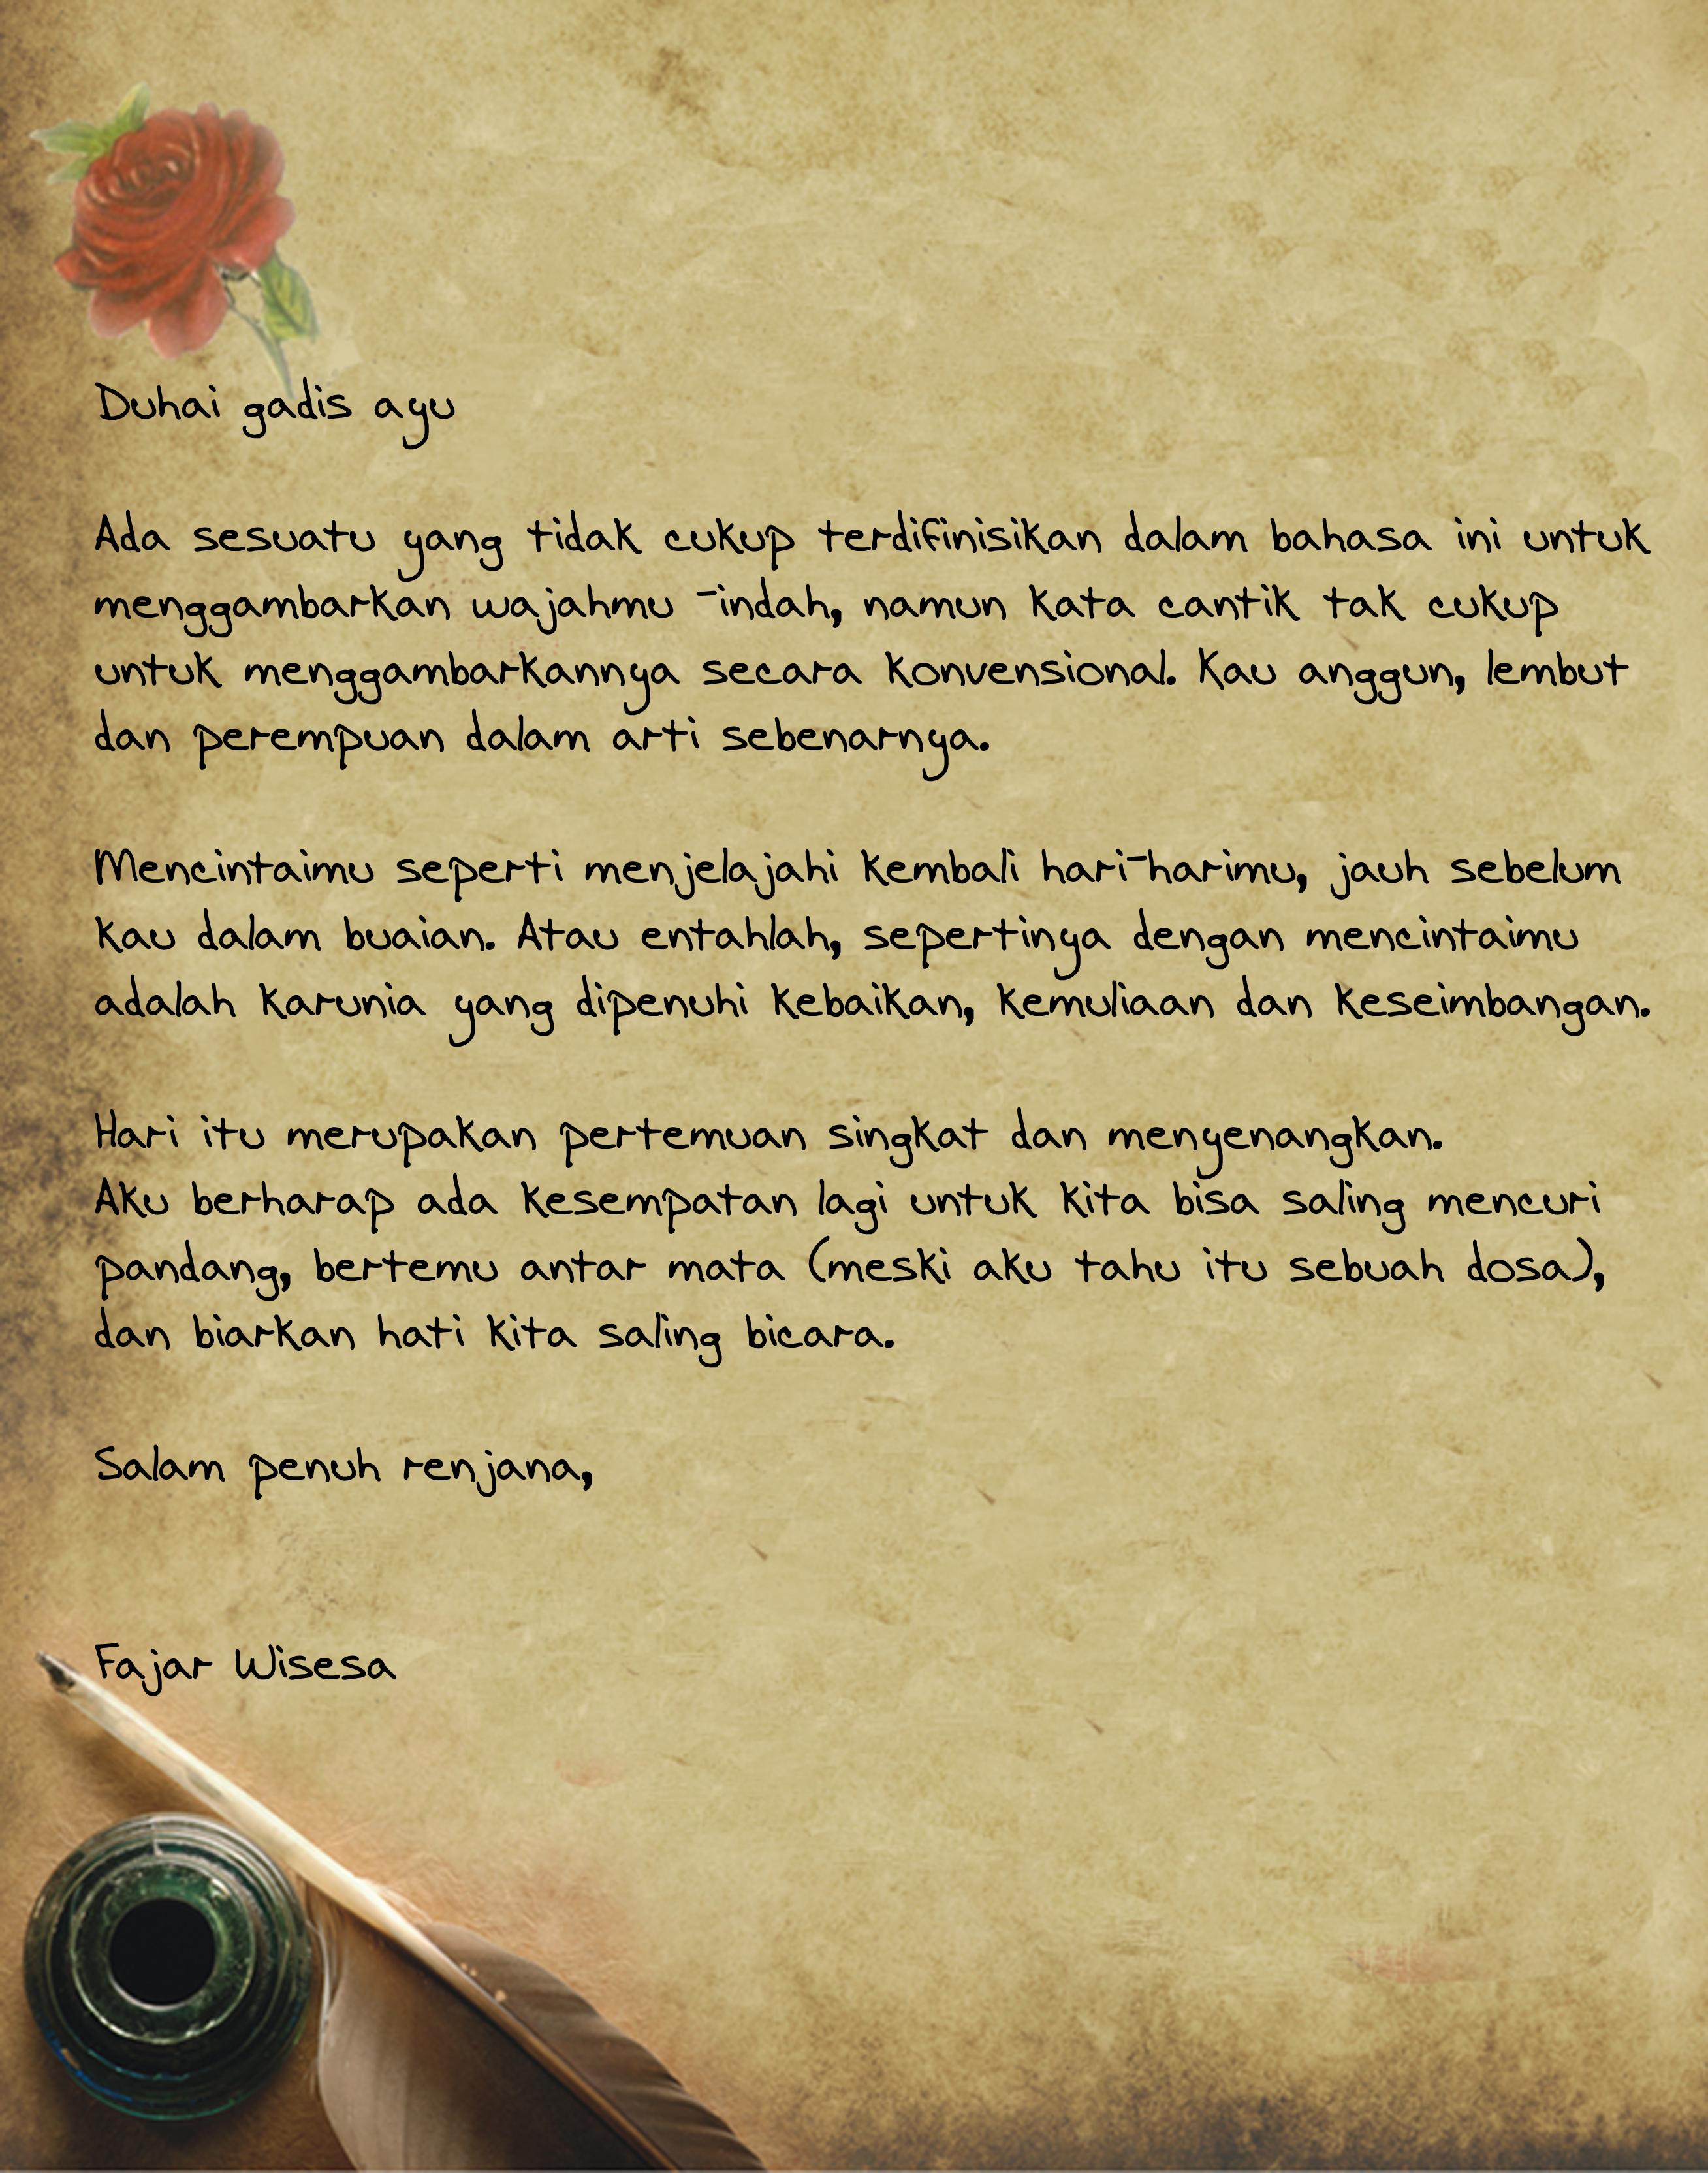 Surat Cinta Fajar Wisesas Blog